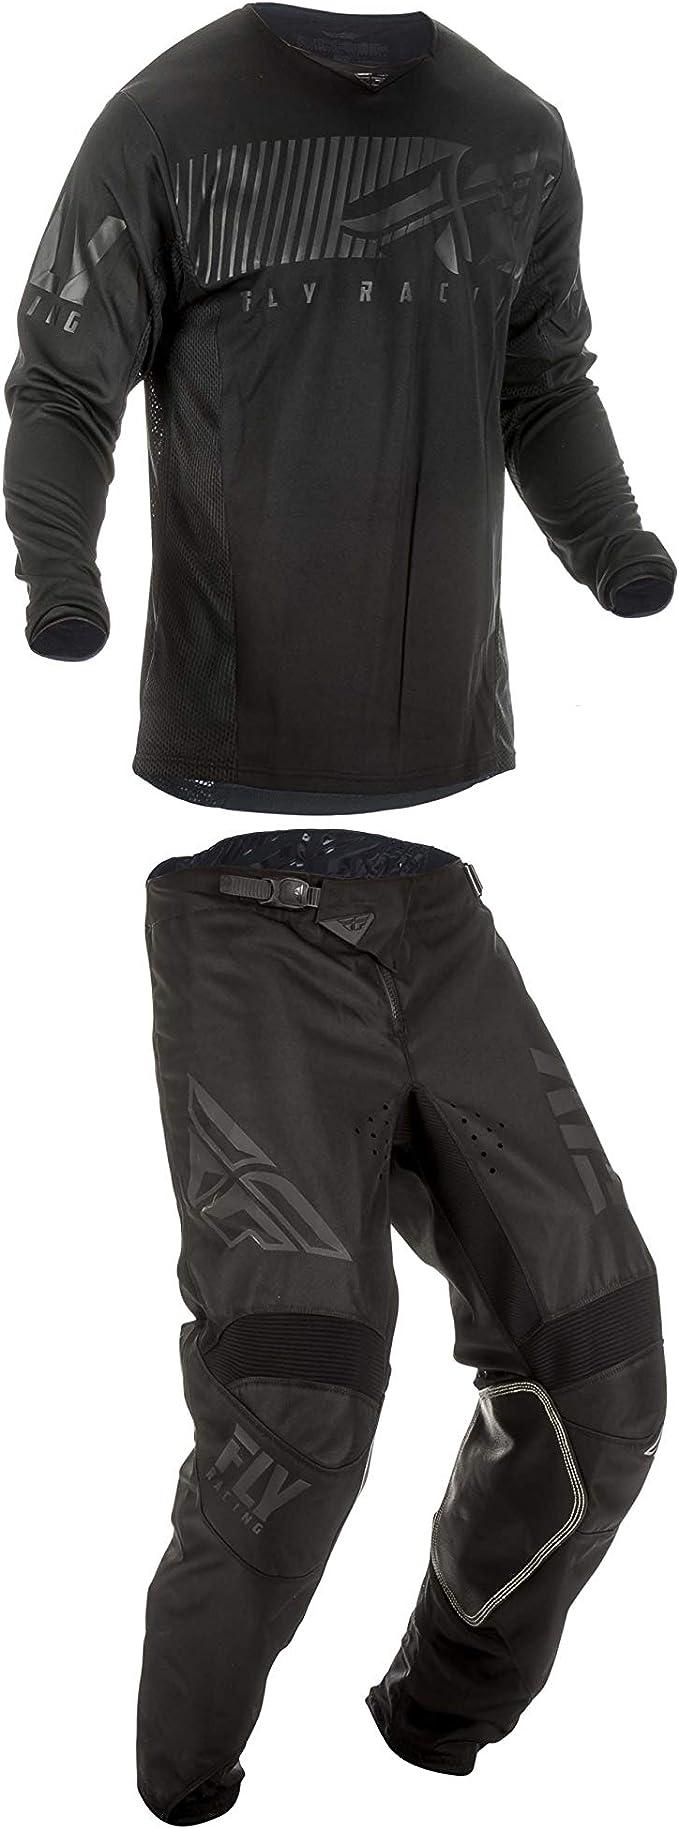 30W Pants//Medium Jersey Fly Racing Mens Kinetic Shield Motocross Pants//Jersey Set Black